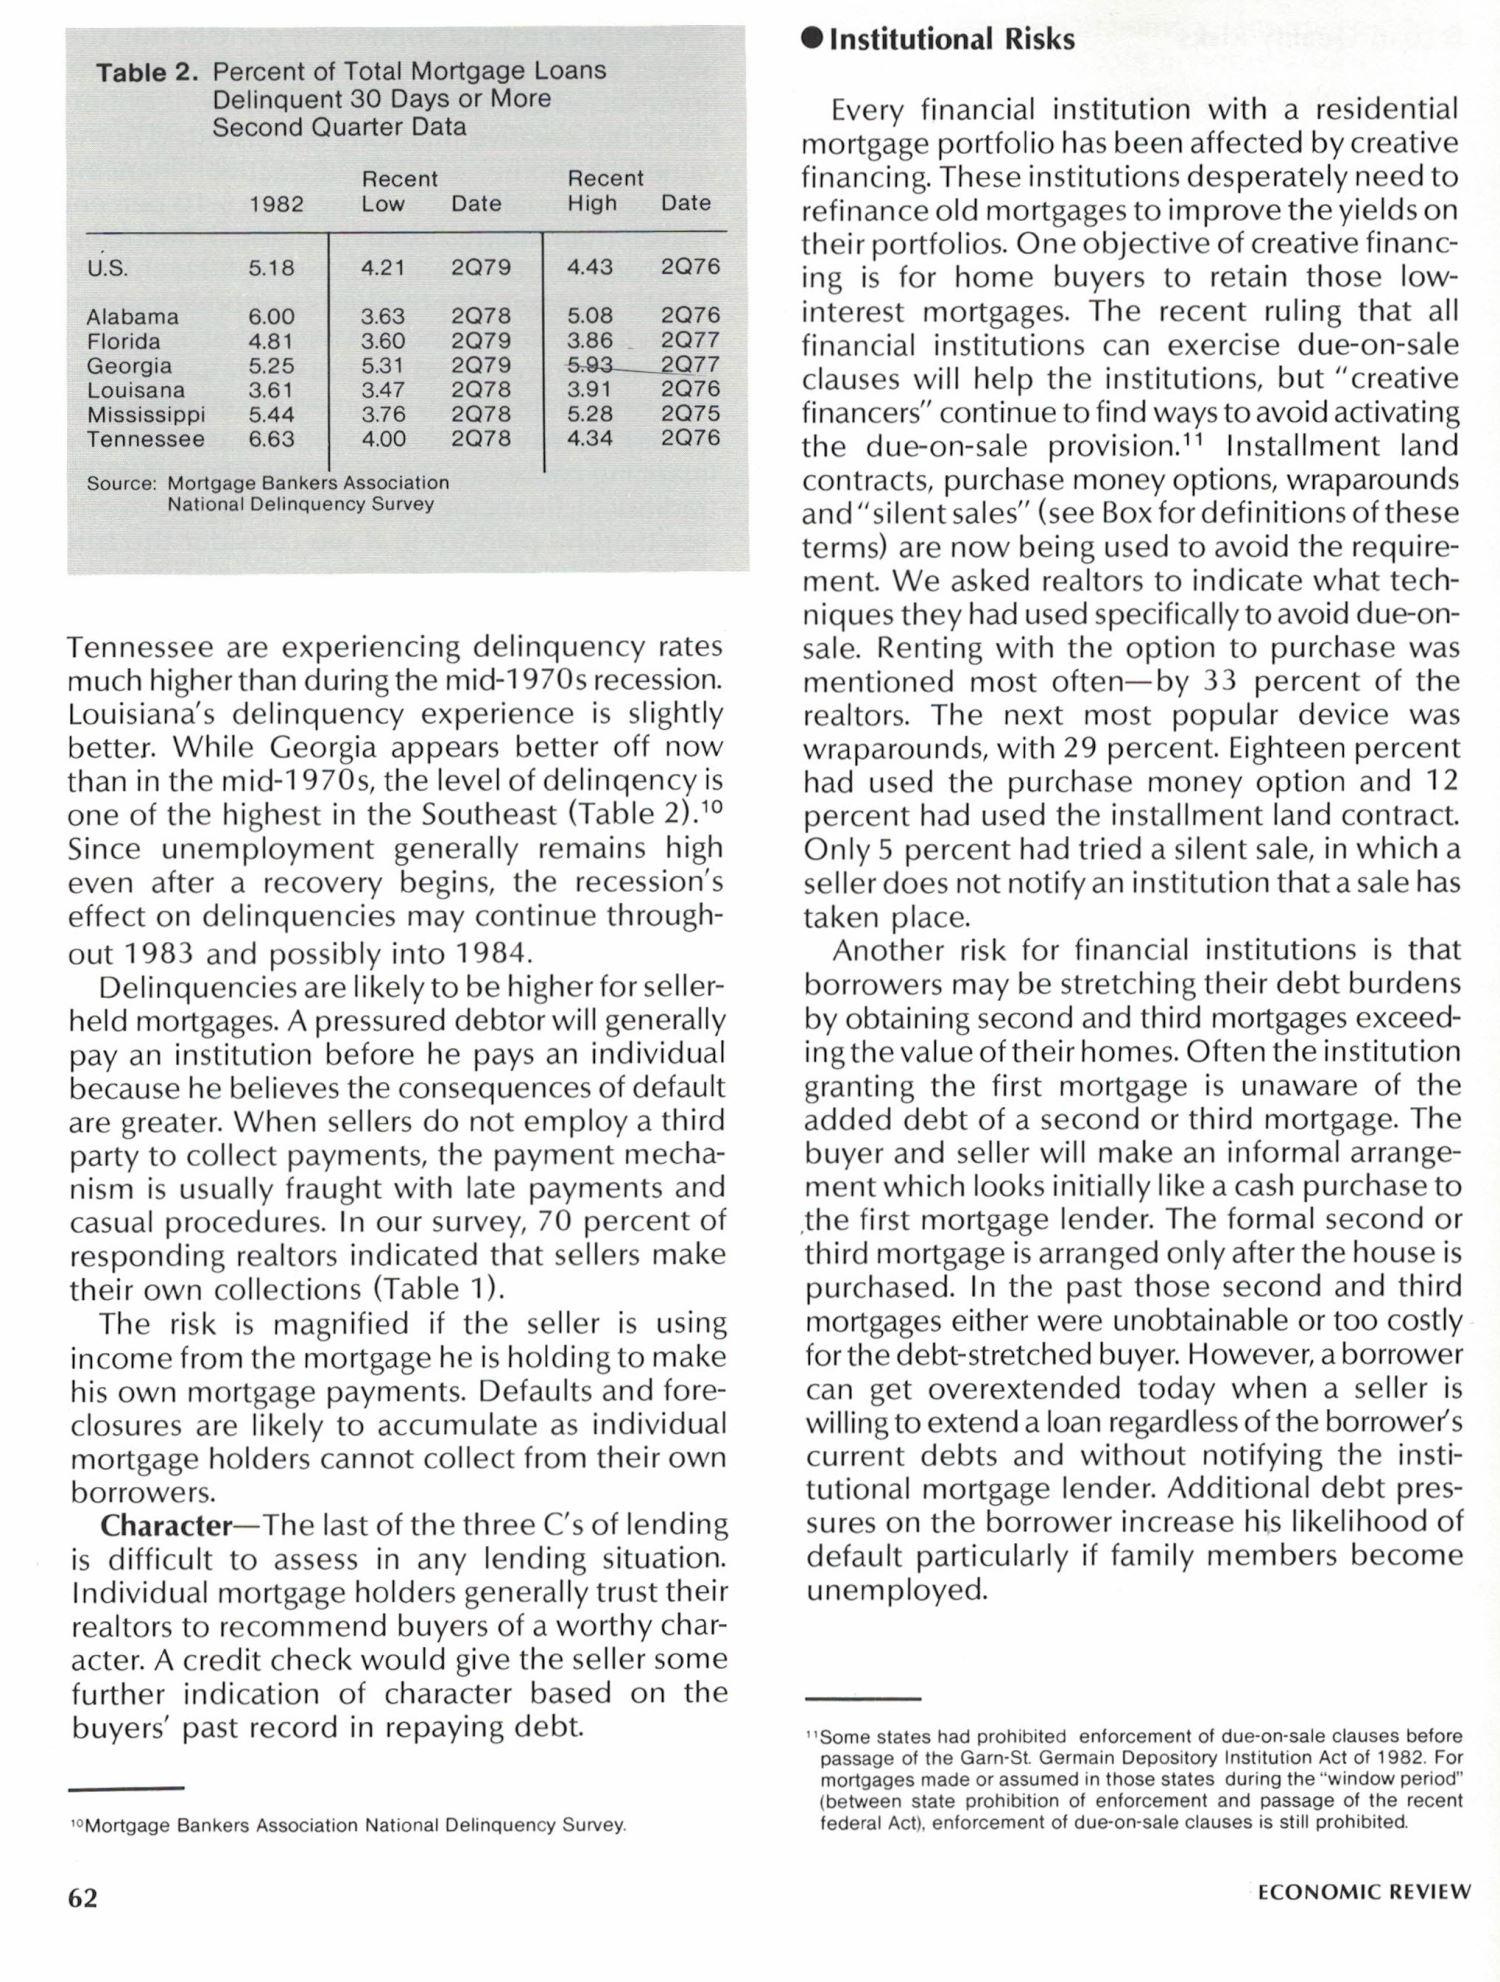 Risks-of-Creative-Financing-6.jpg